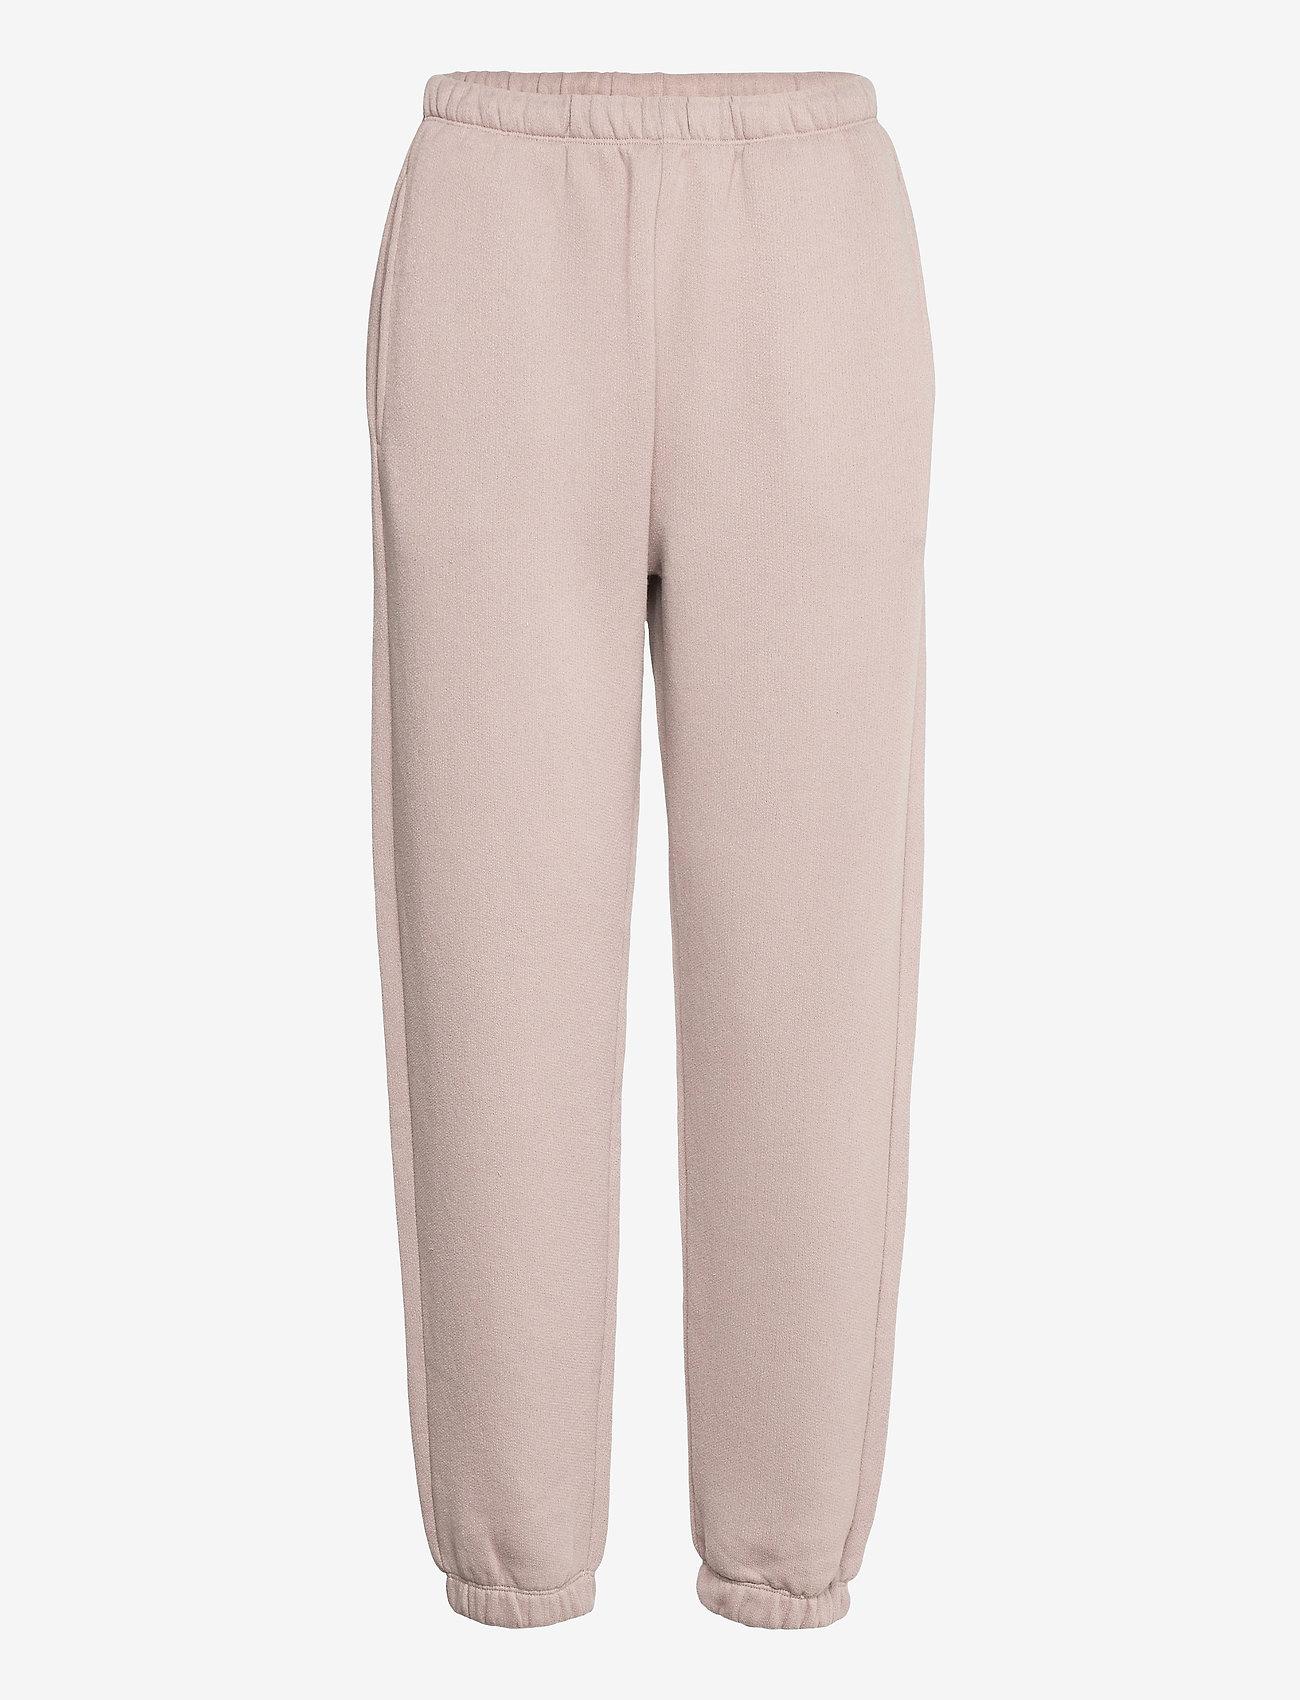 American Vintage - IKATOWN - sweatpants - taupe - 0